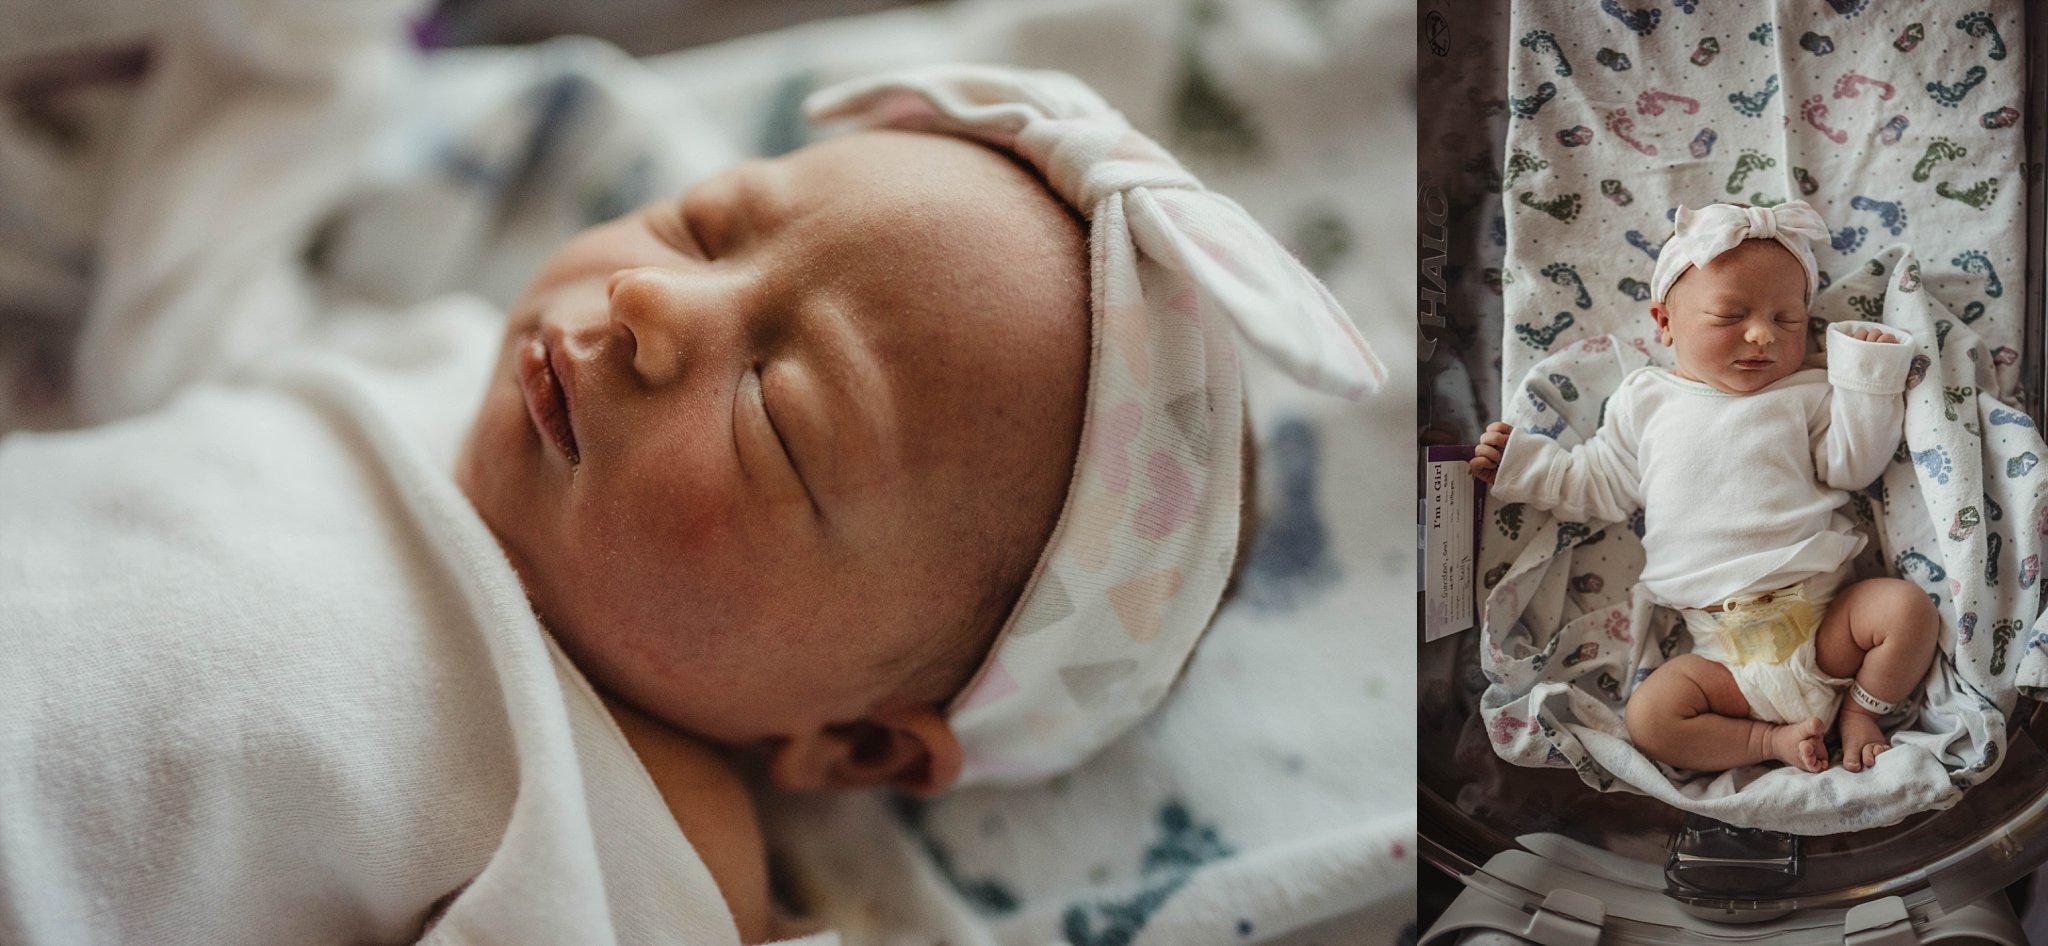 BrittneyHogue-BirthPhotographer-Fresh48Photographer-NewbornPhotographer-PeoriaIL-PekinIL-BloomingtonIL-GalesburgIL (1).jpg